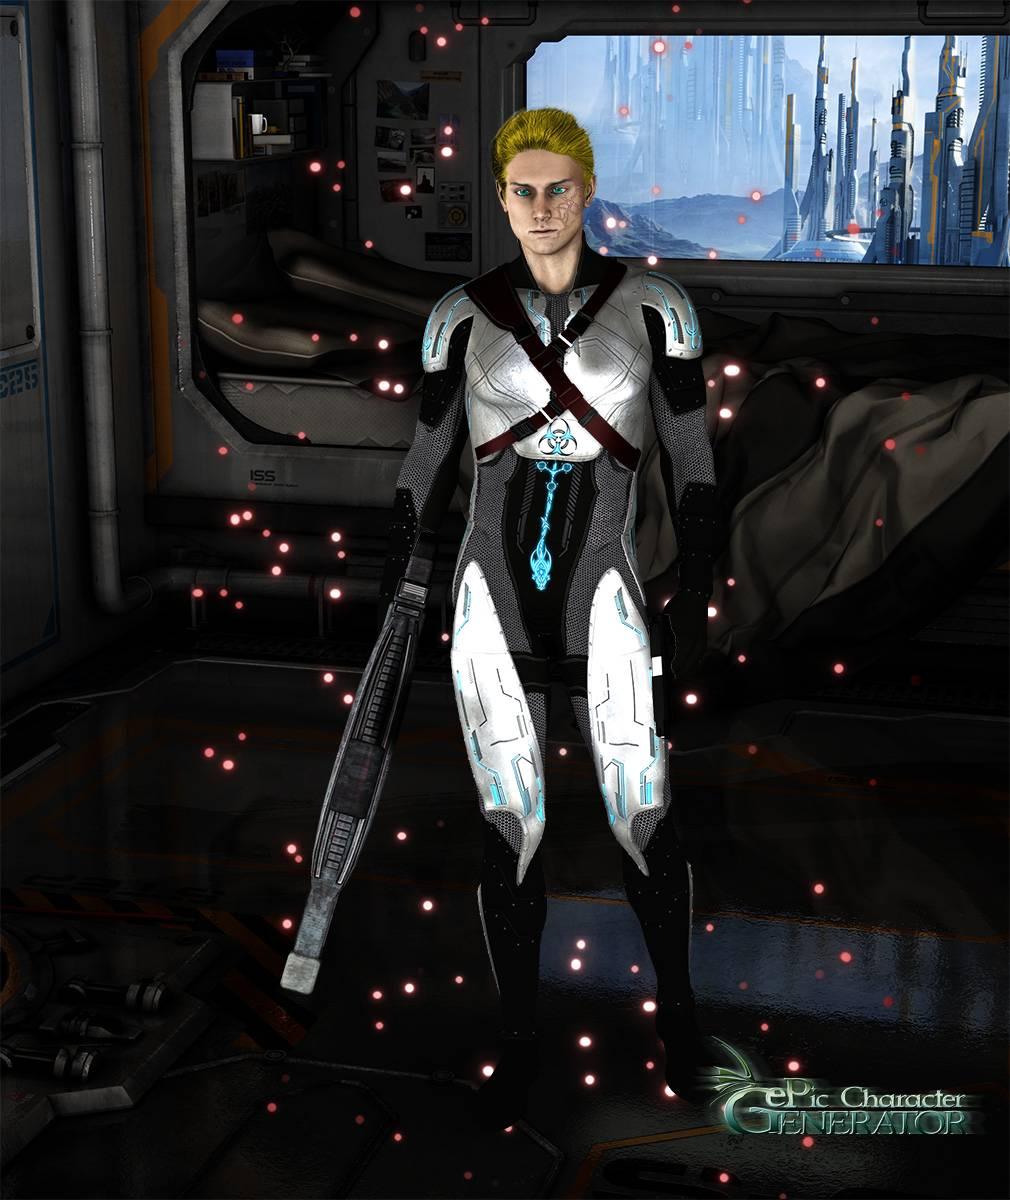 ePic Character Generator Season 2 Male Superhero Screenshot 01